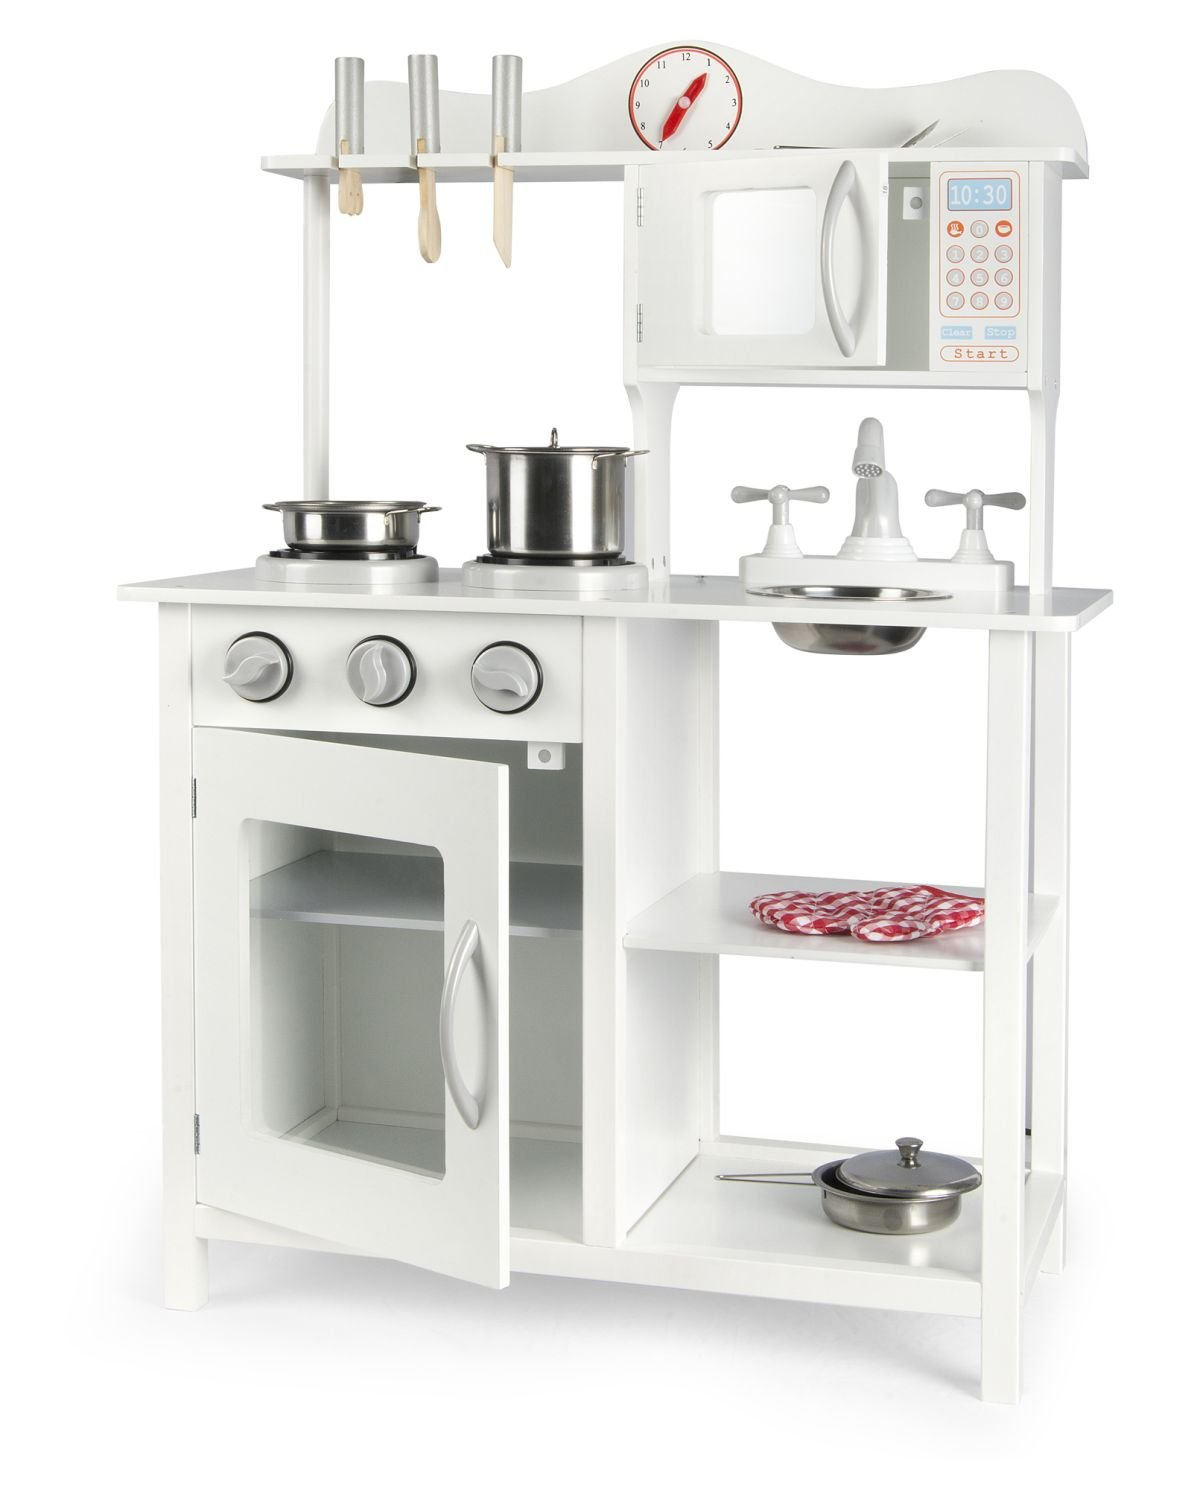 Tolle Holzküche Wagen Ideen - Küchen Ideen Modern ...